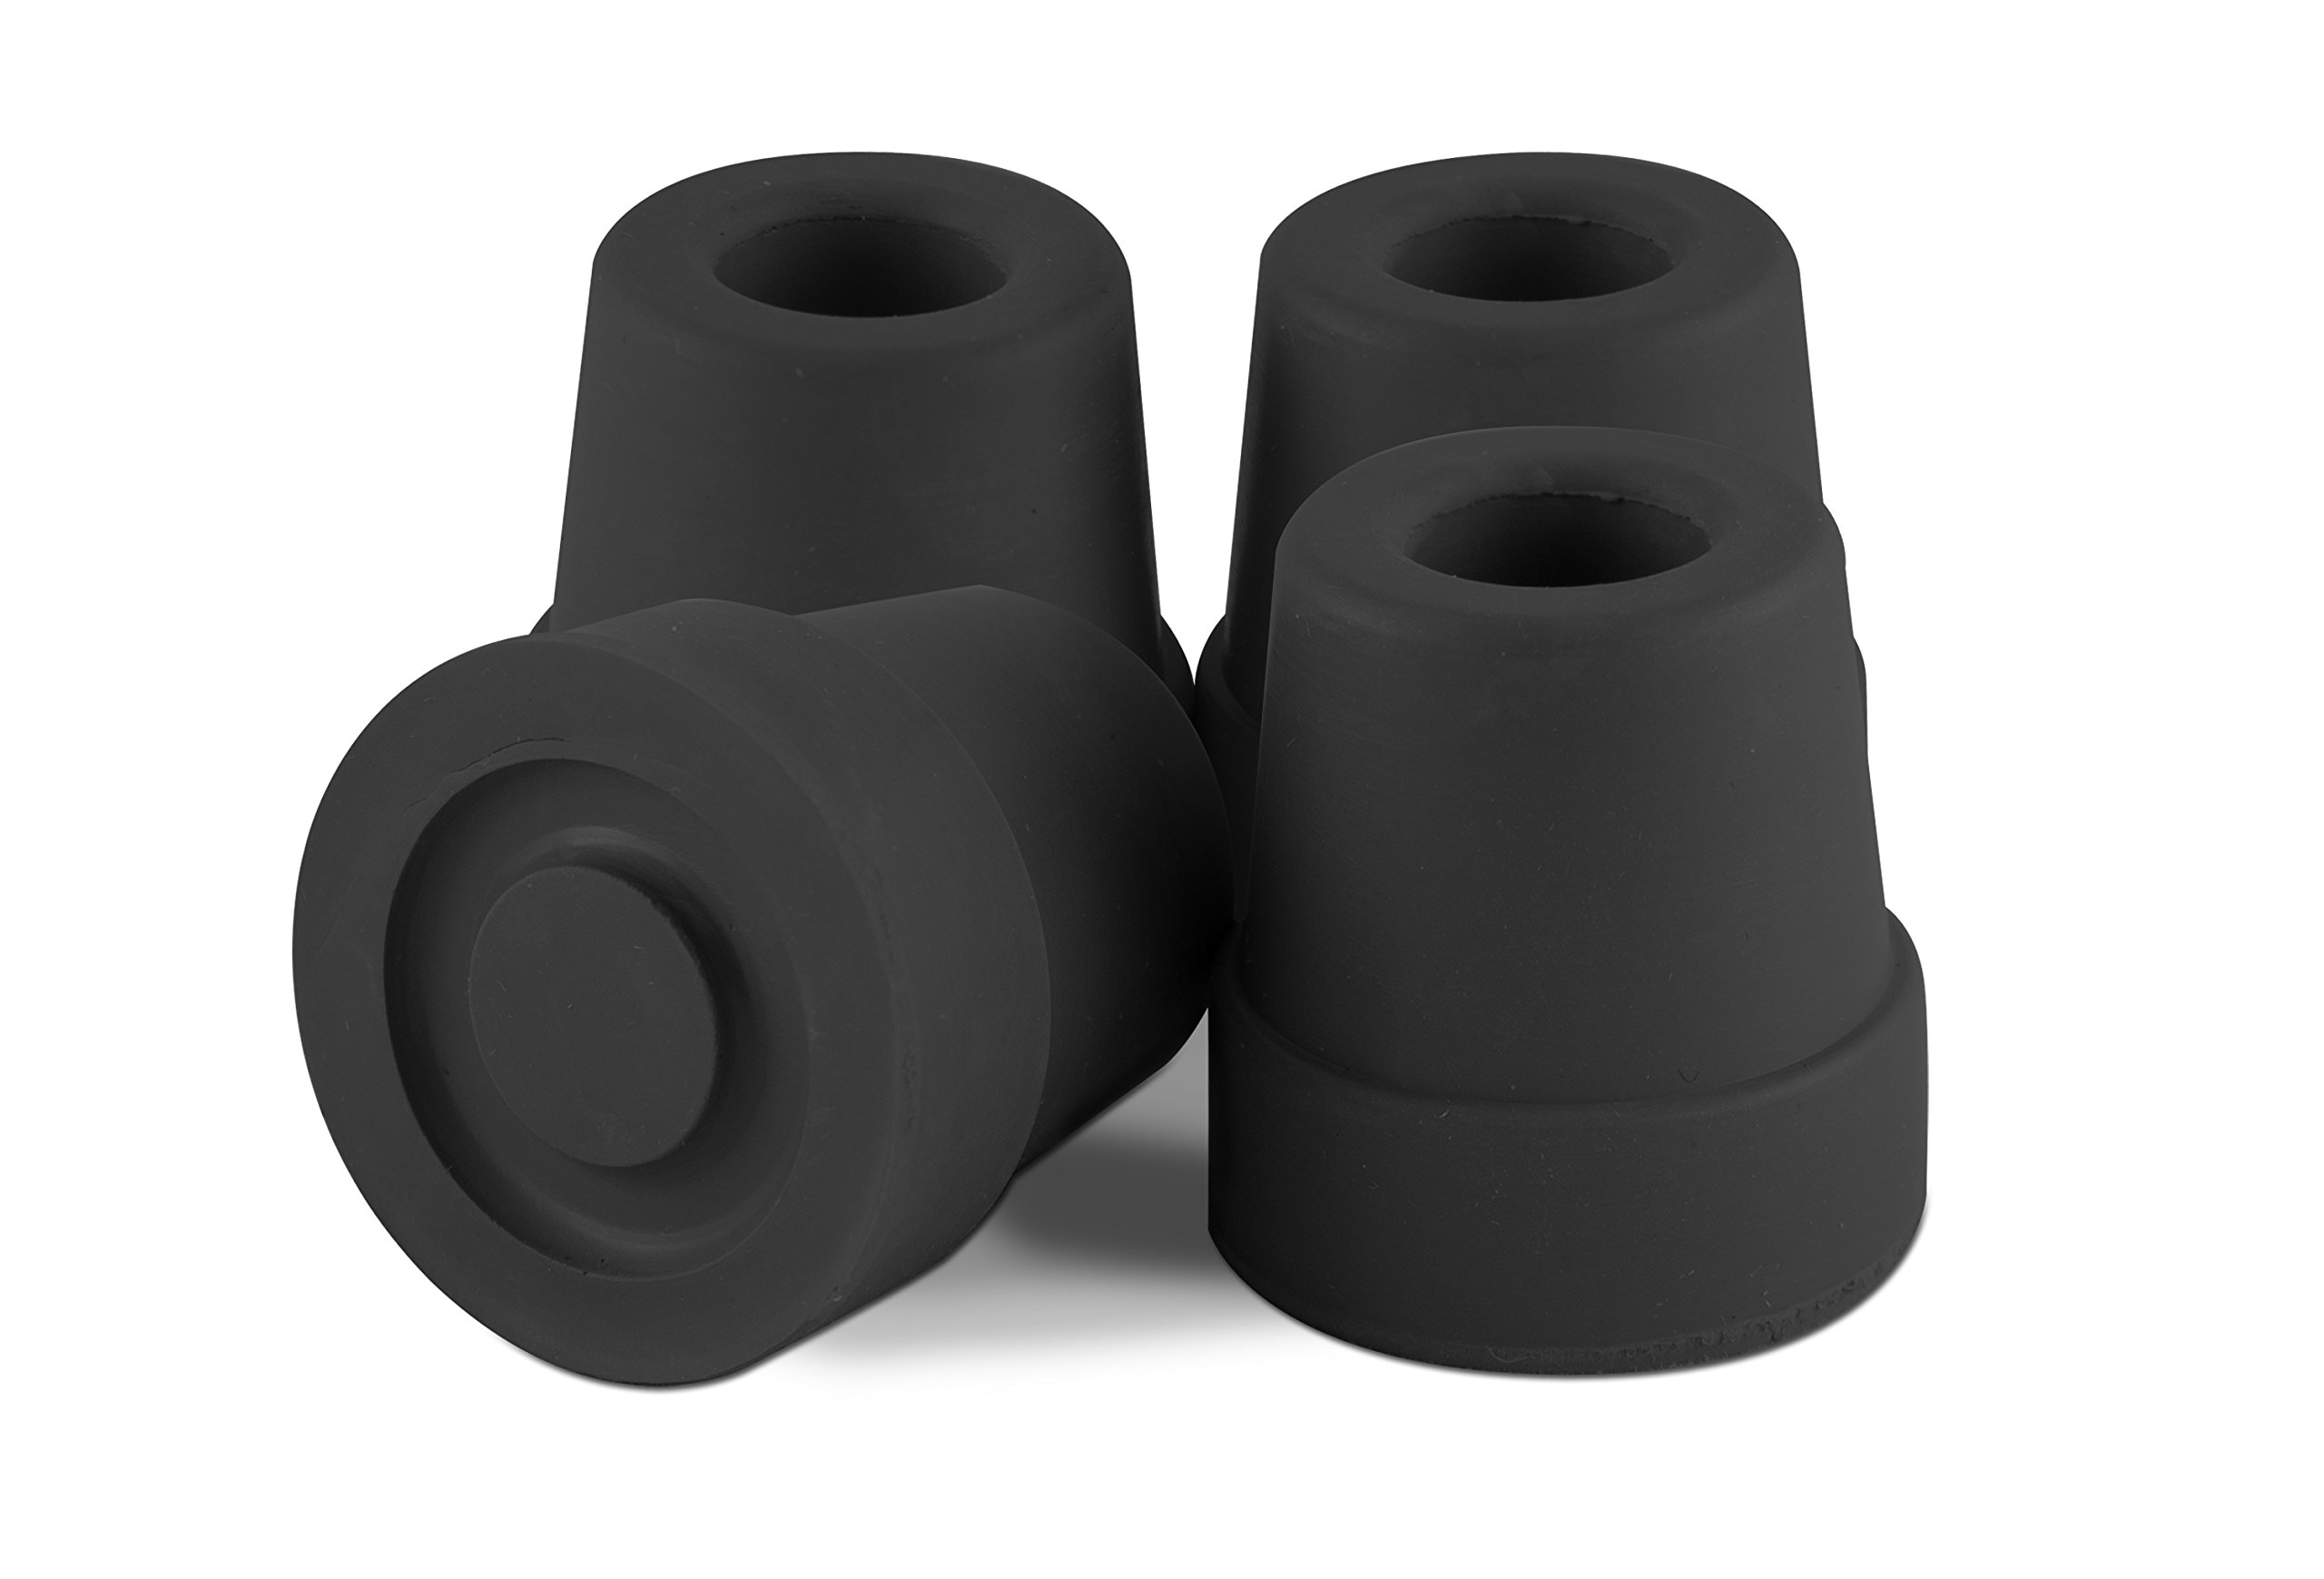 Essential Medical Supply T50012bl Quad Cane Tips, Black, 1/2 Inch